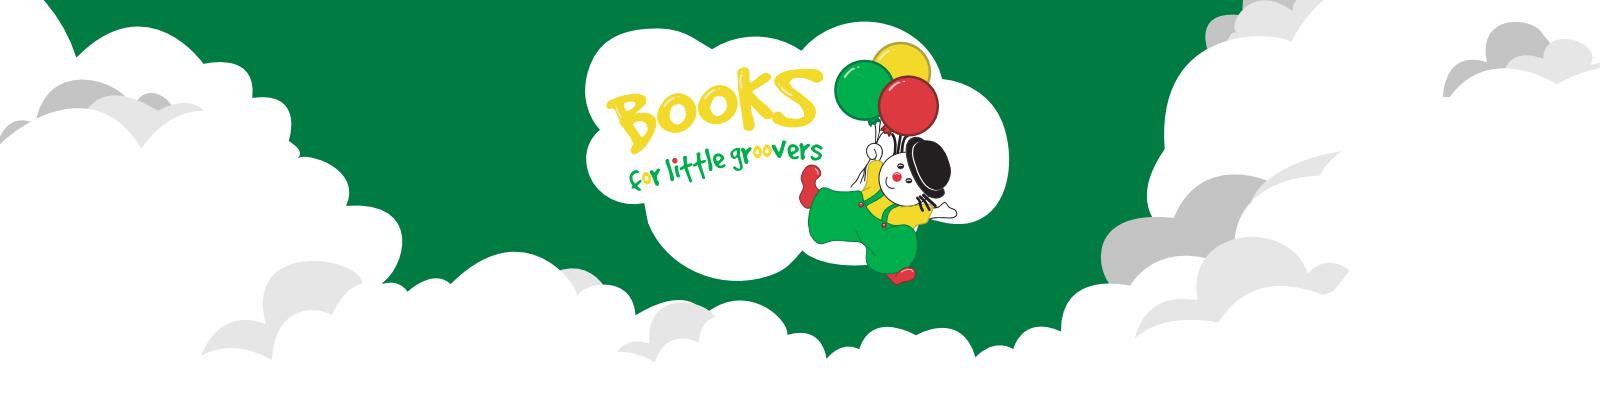 Gannadoo books for little groovers